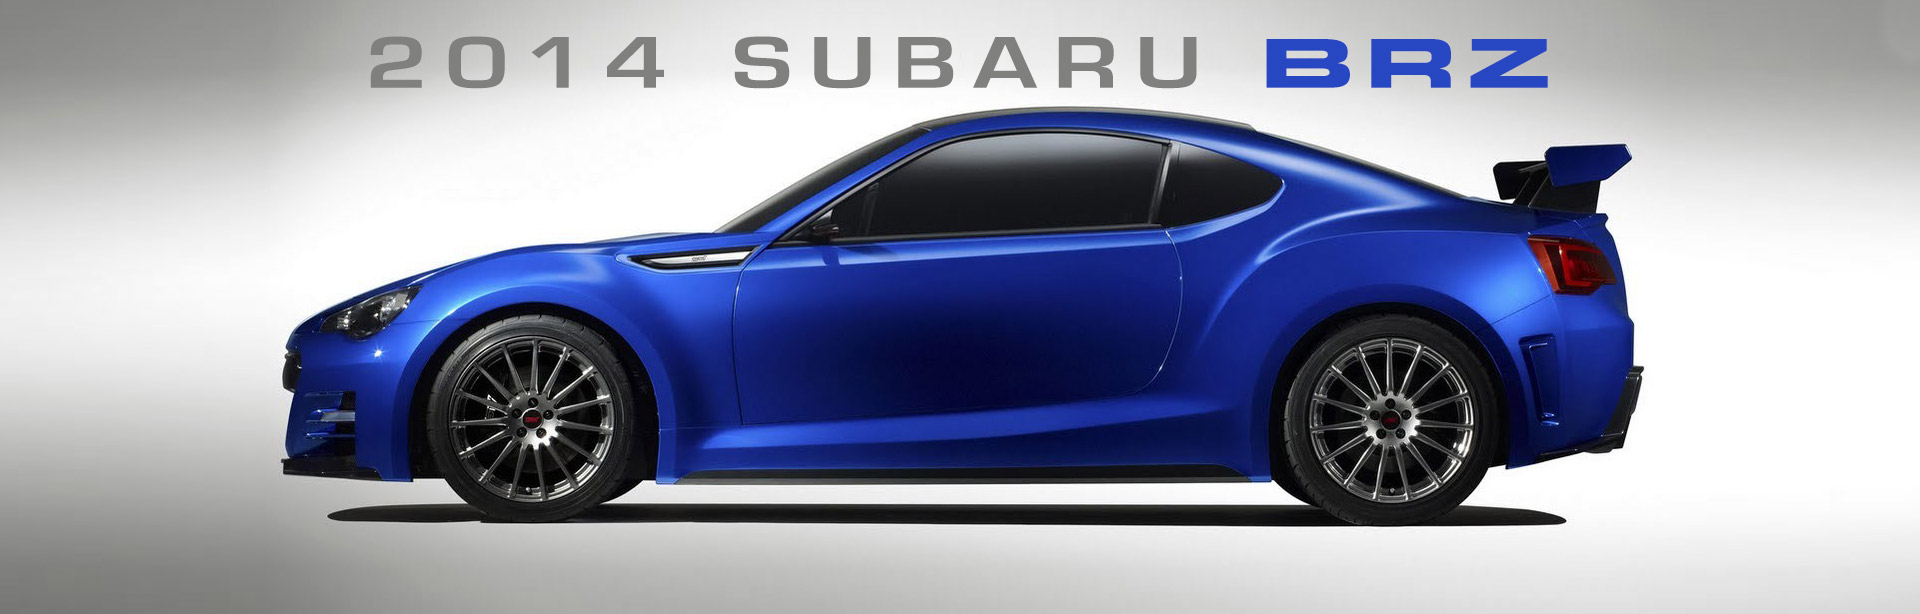 Subaru BRZ at Briggs of Topeka